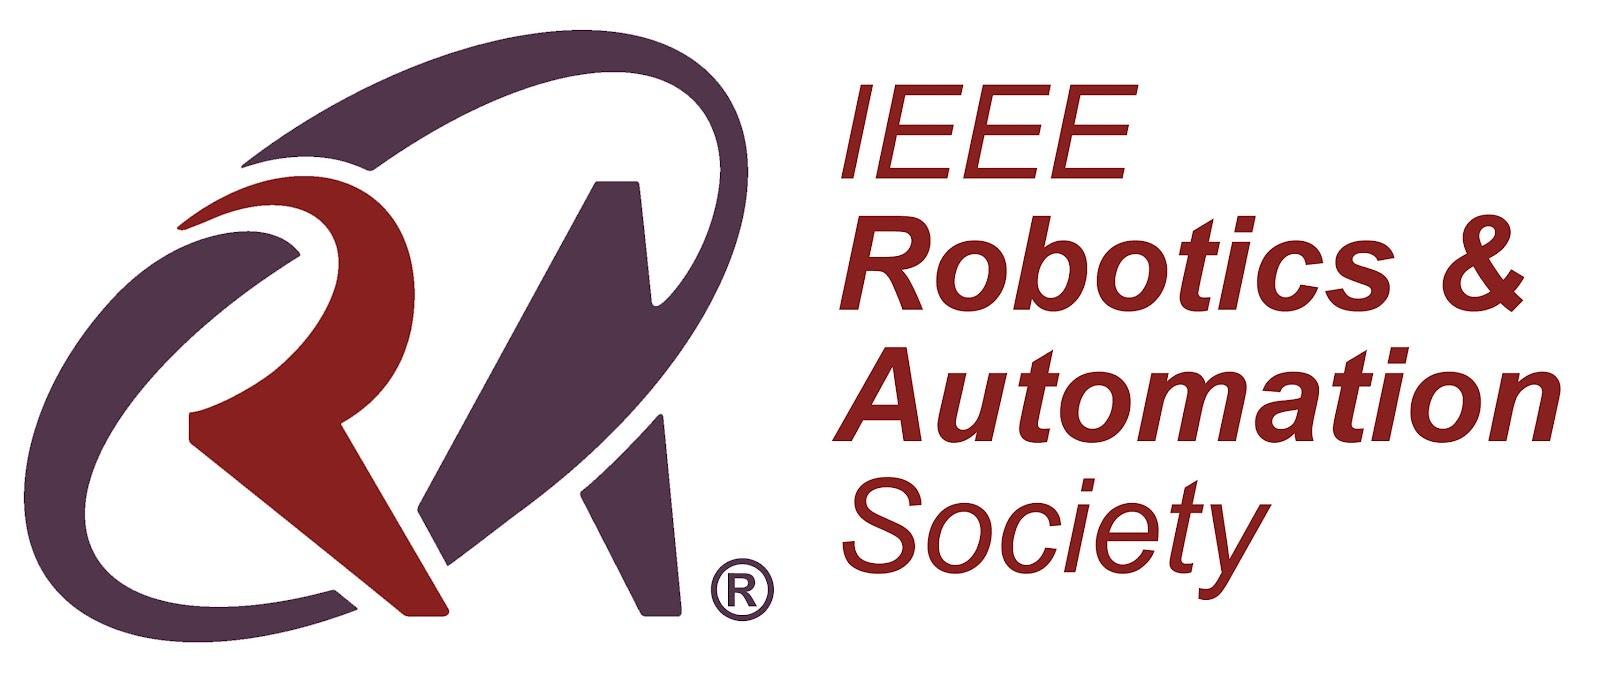 4th Biennial North American Summer School On Surgical Robotics